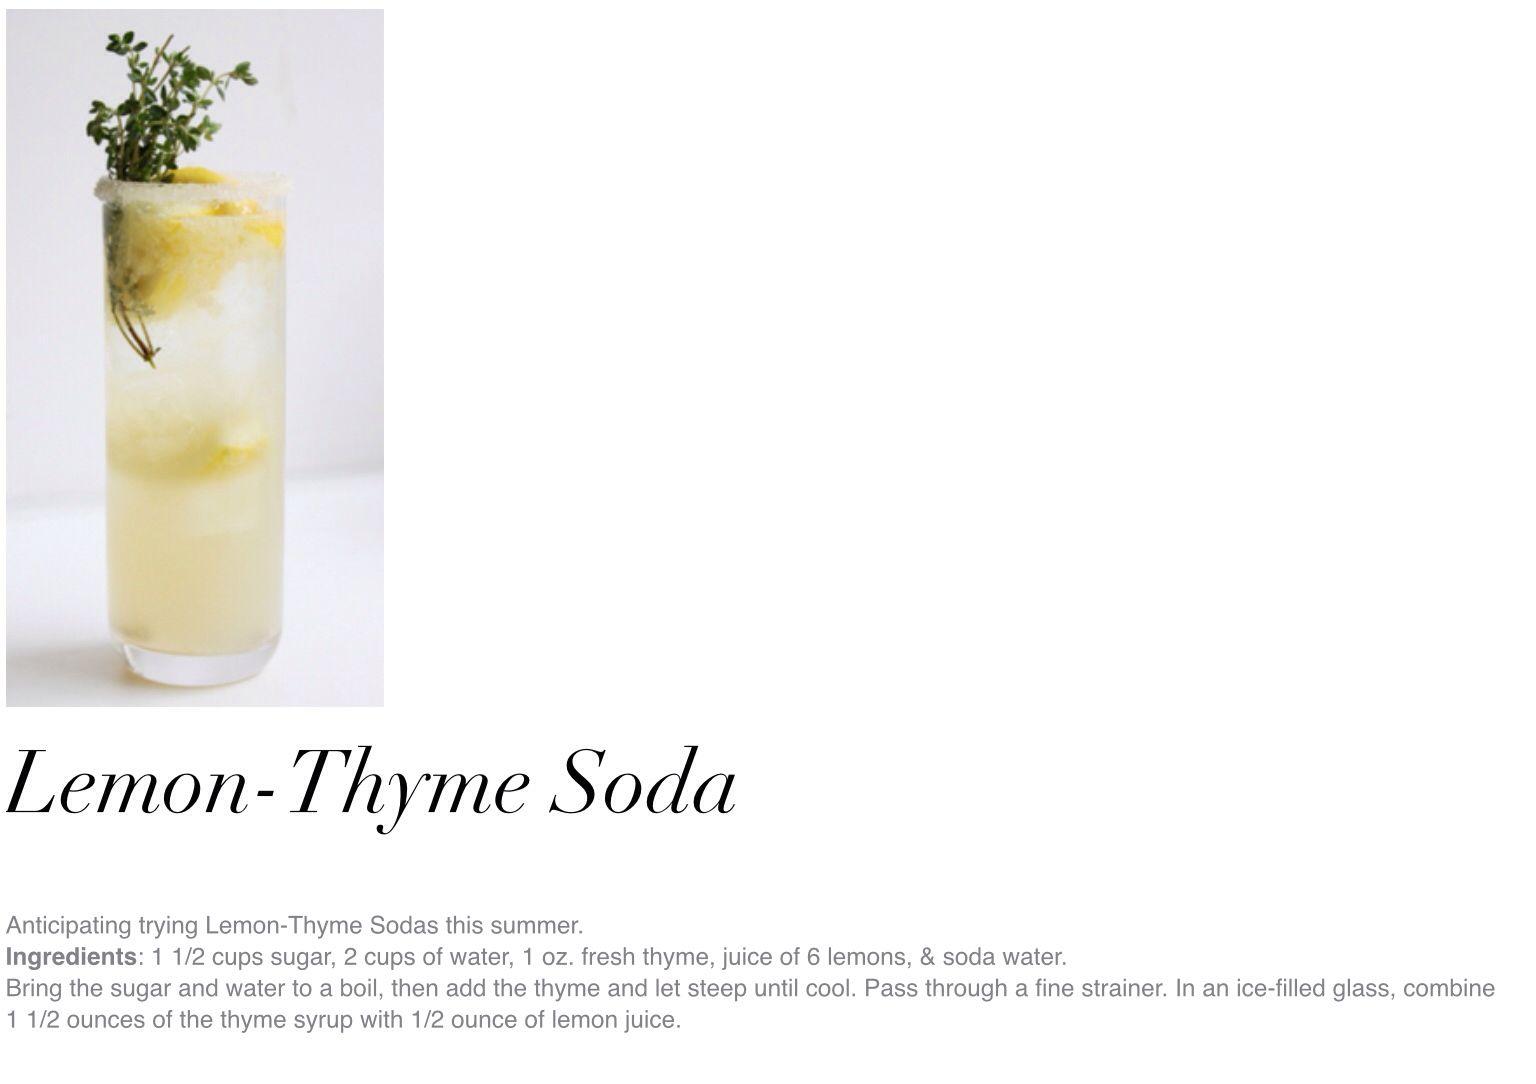 Lemon-thyme soda!